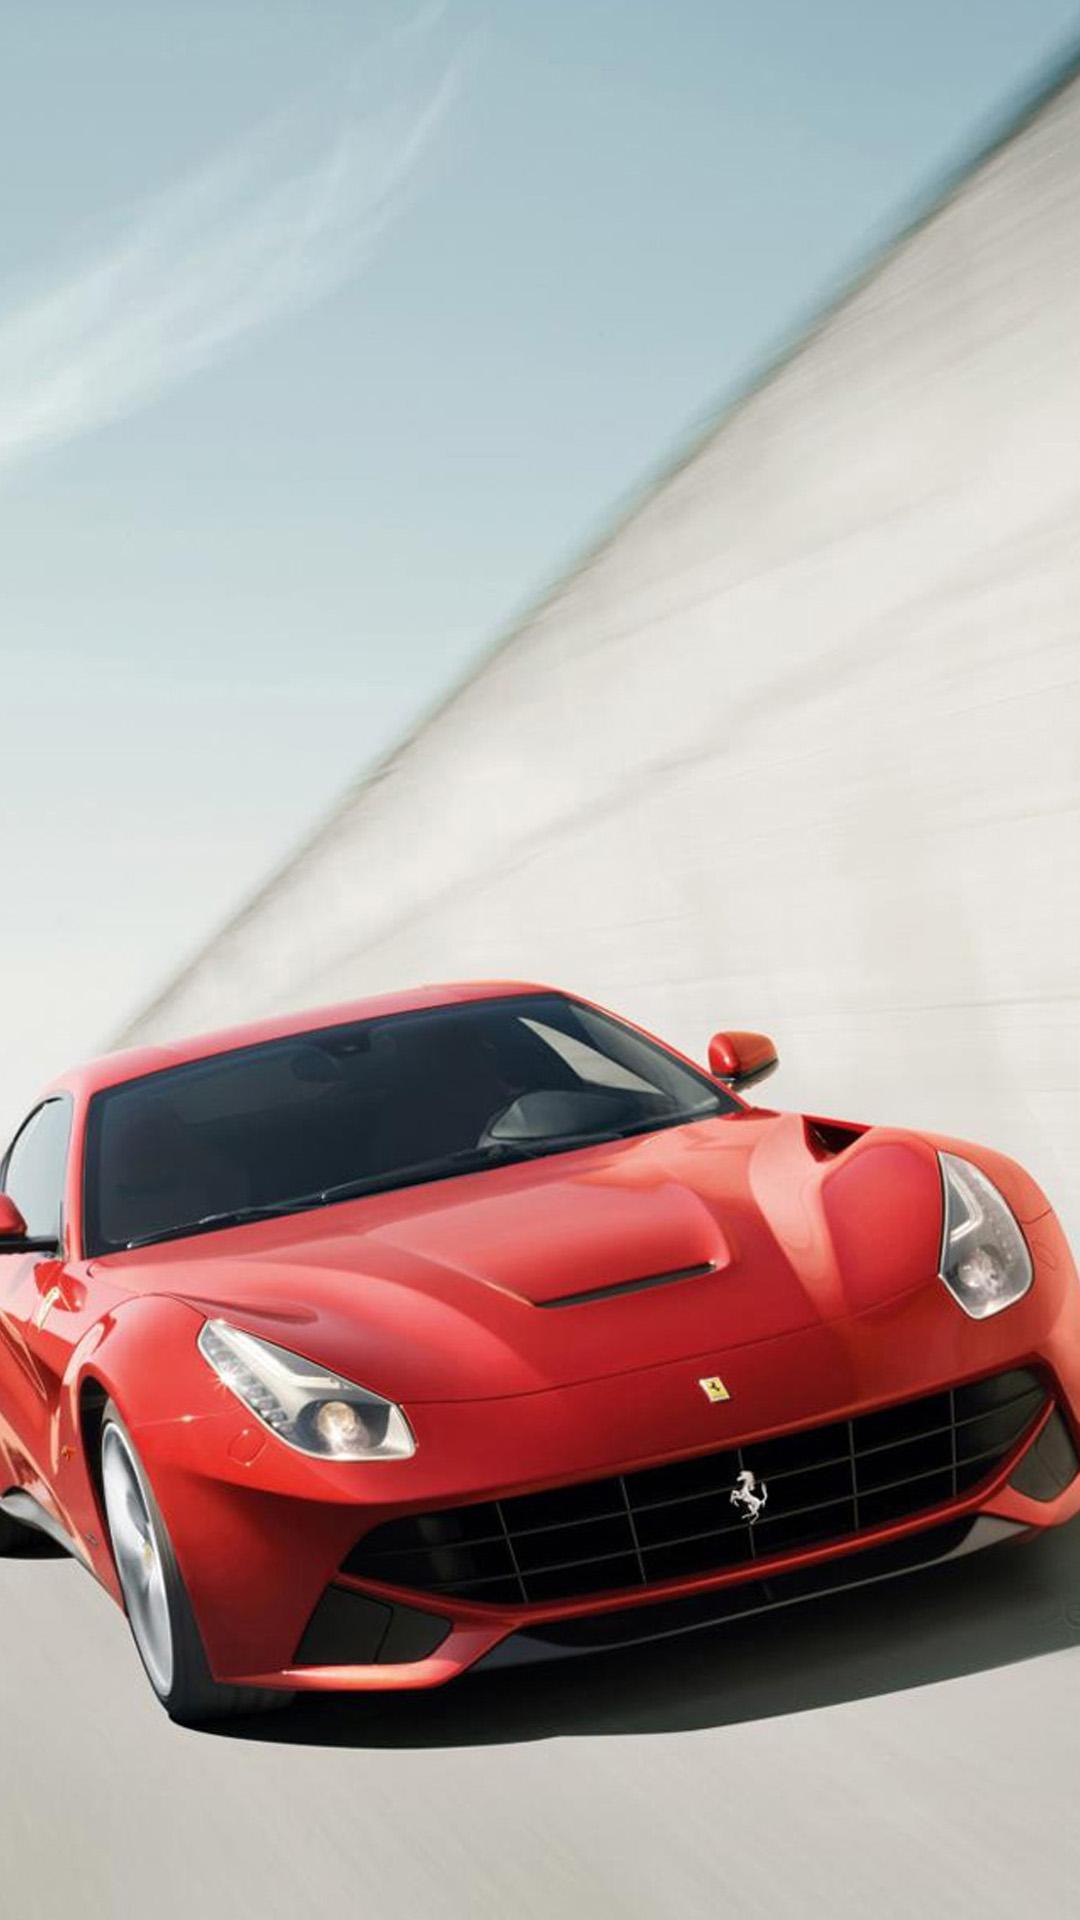 Iphone 7 Wallpaper Ferrari